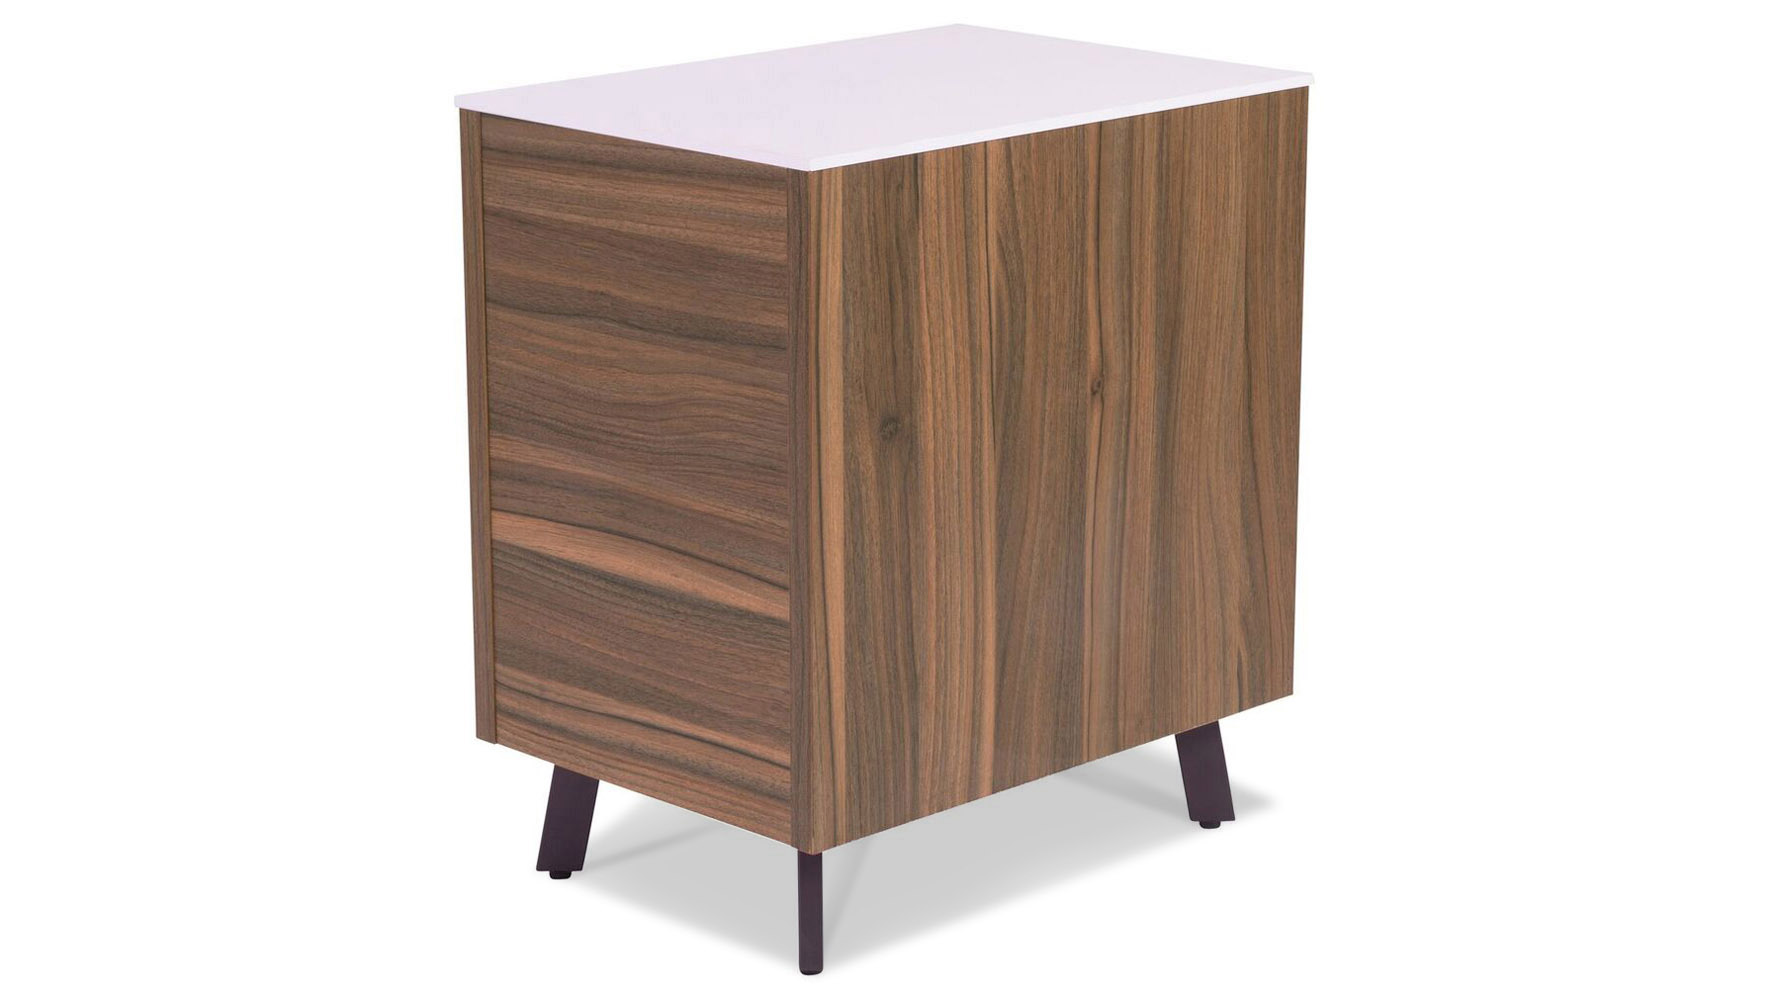 White wood 2 drawer file cabinet - Alston 2 Drawer Filing Cabinet